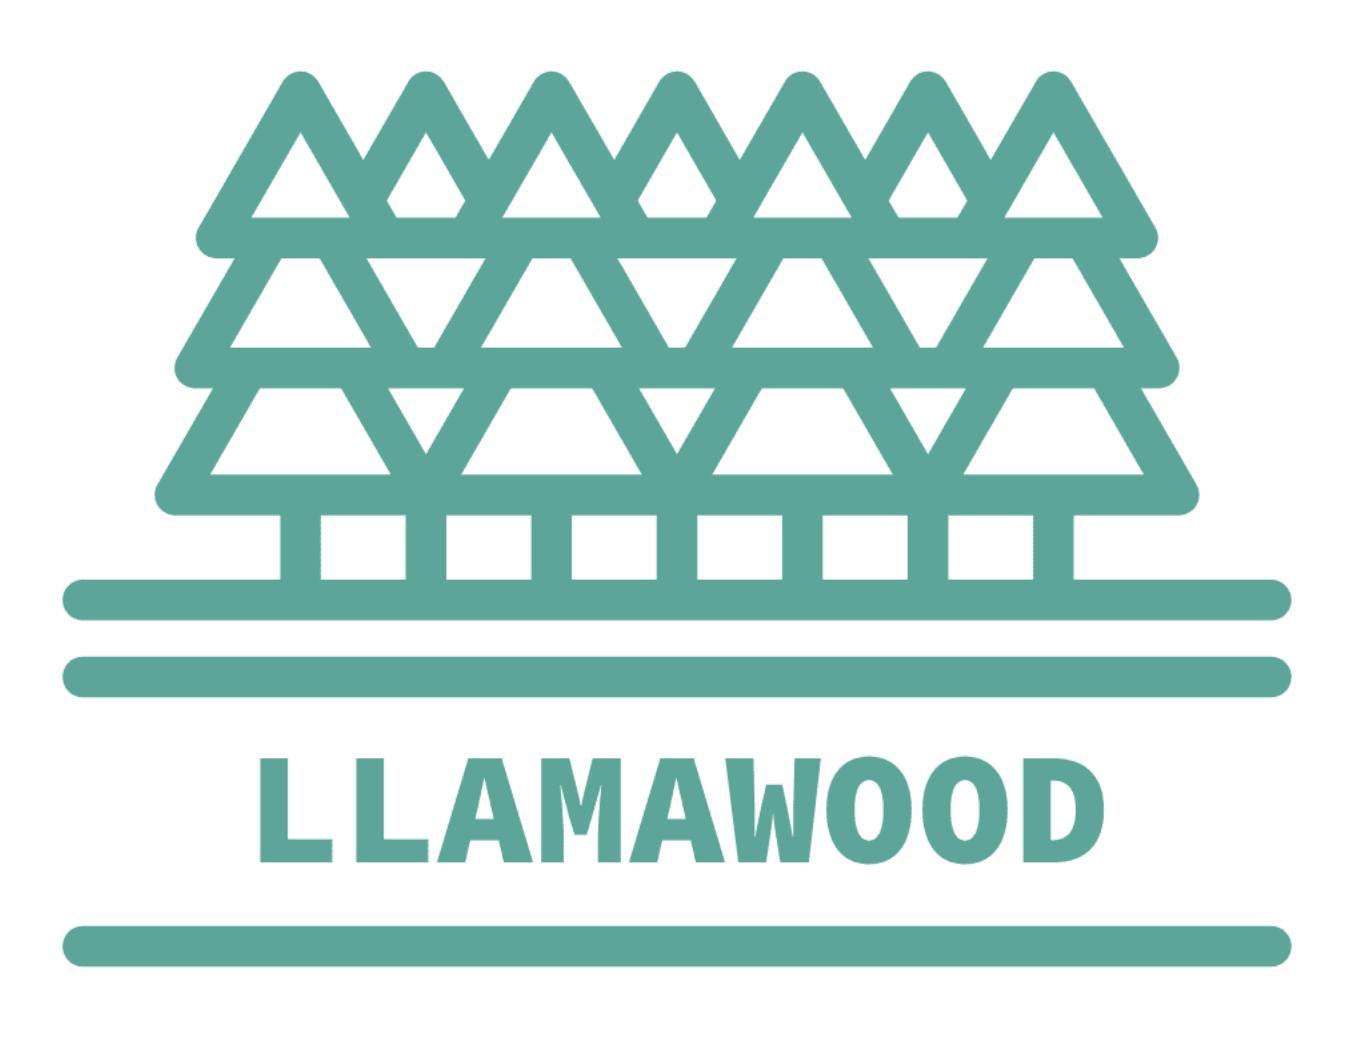 llamawood logo